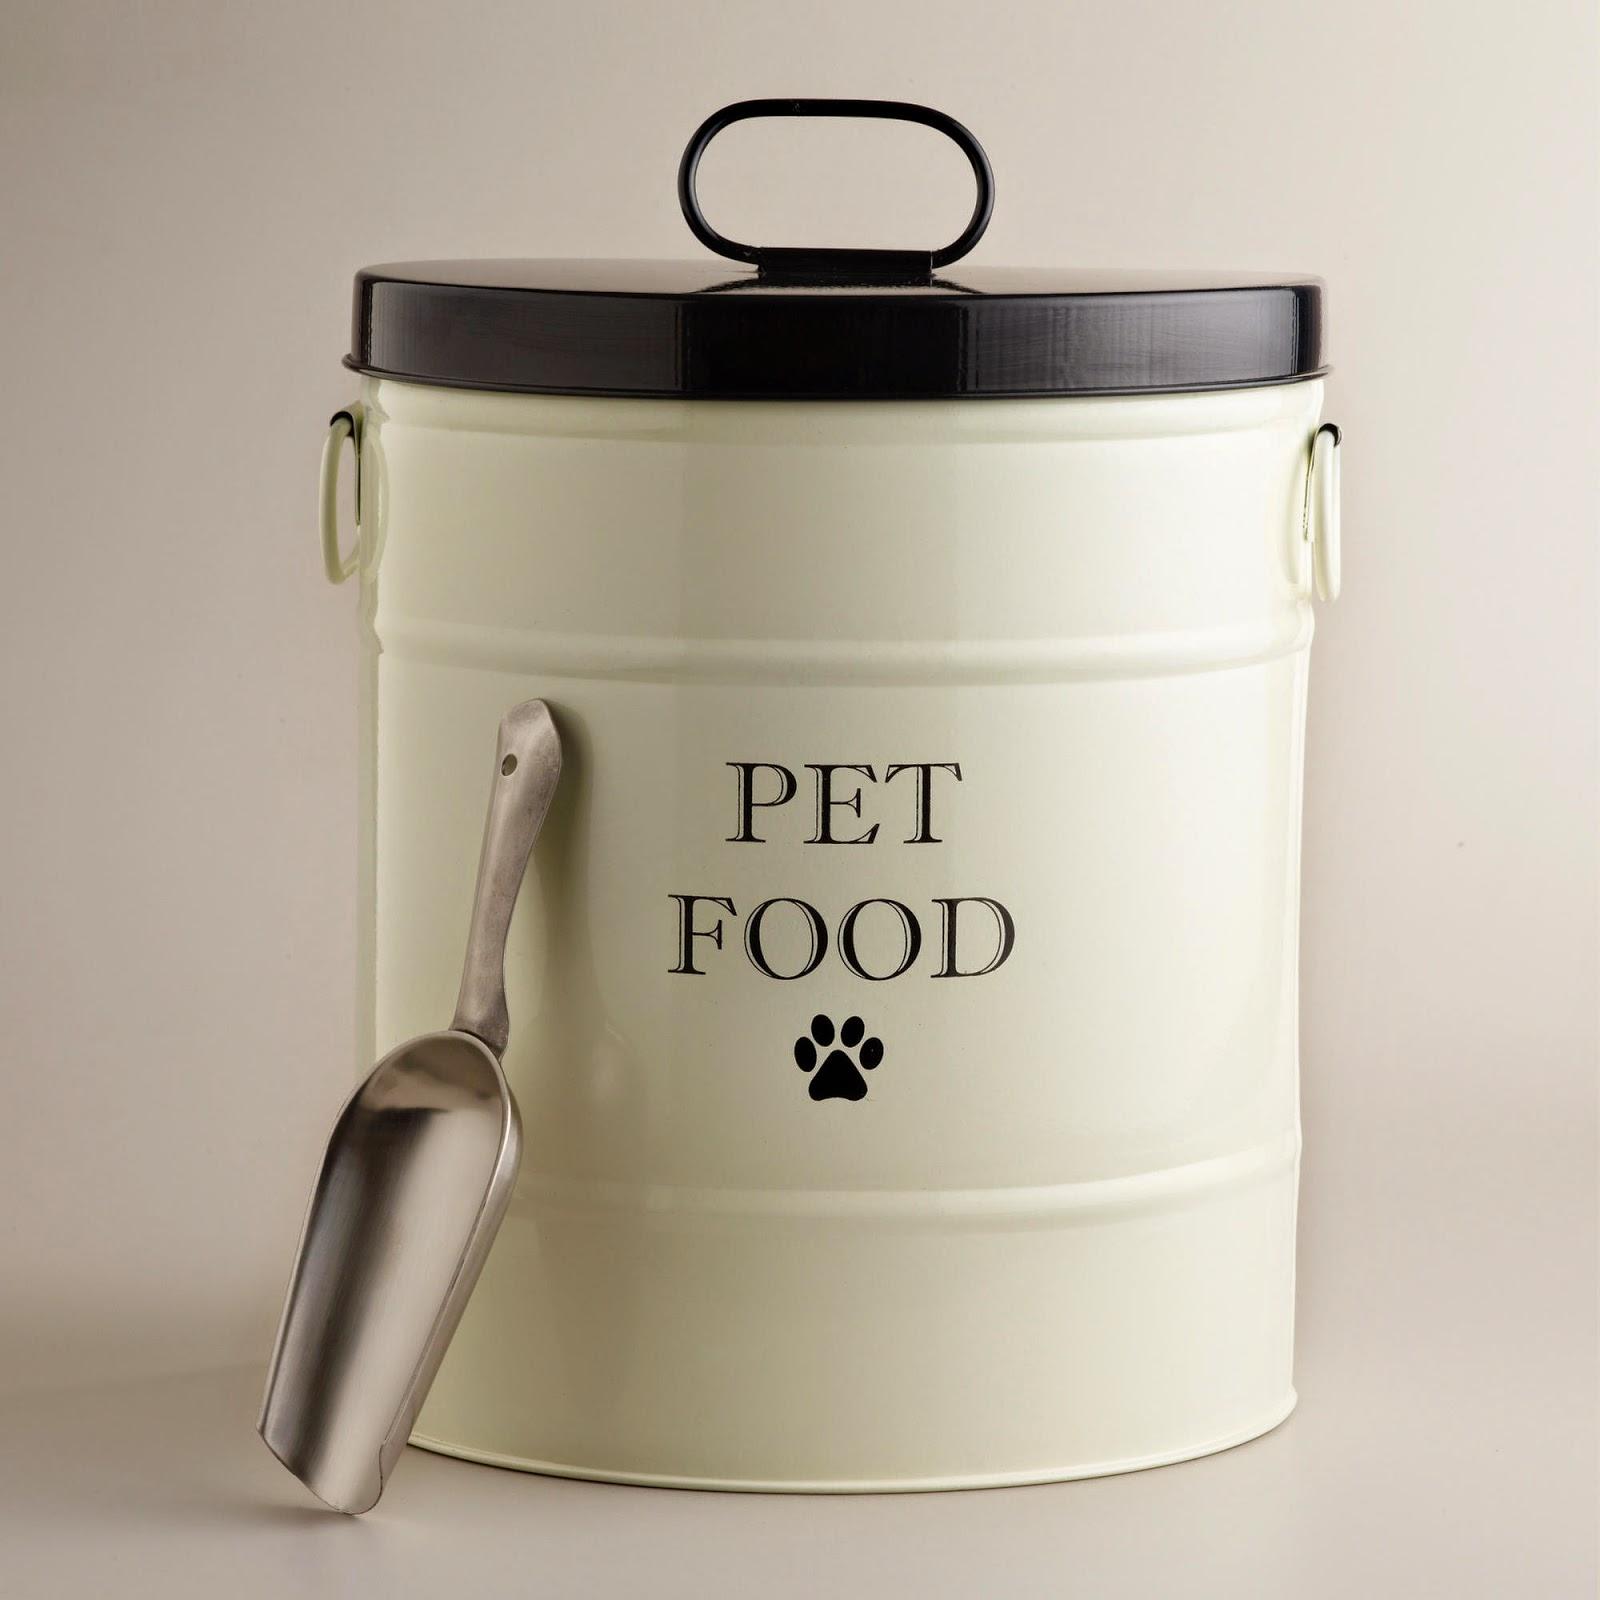 Rustic Dog Food Storage Tins Vintage Tk Maxx